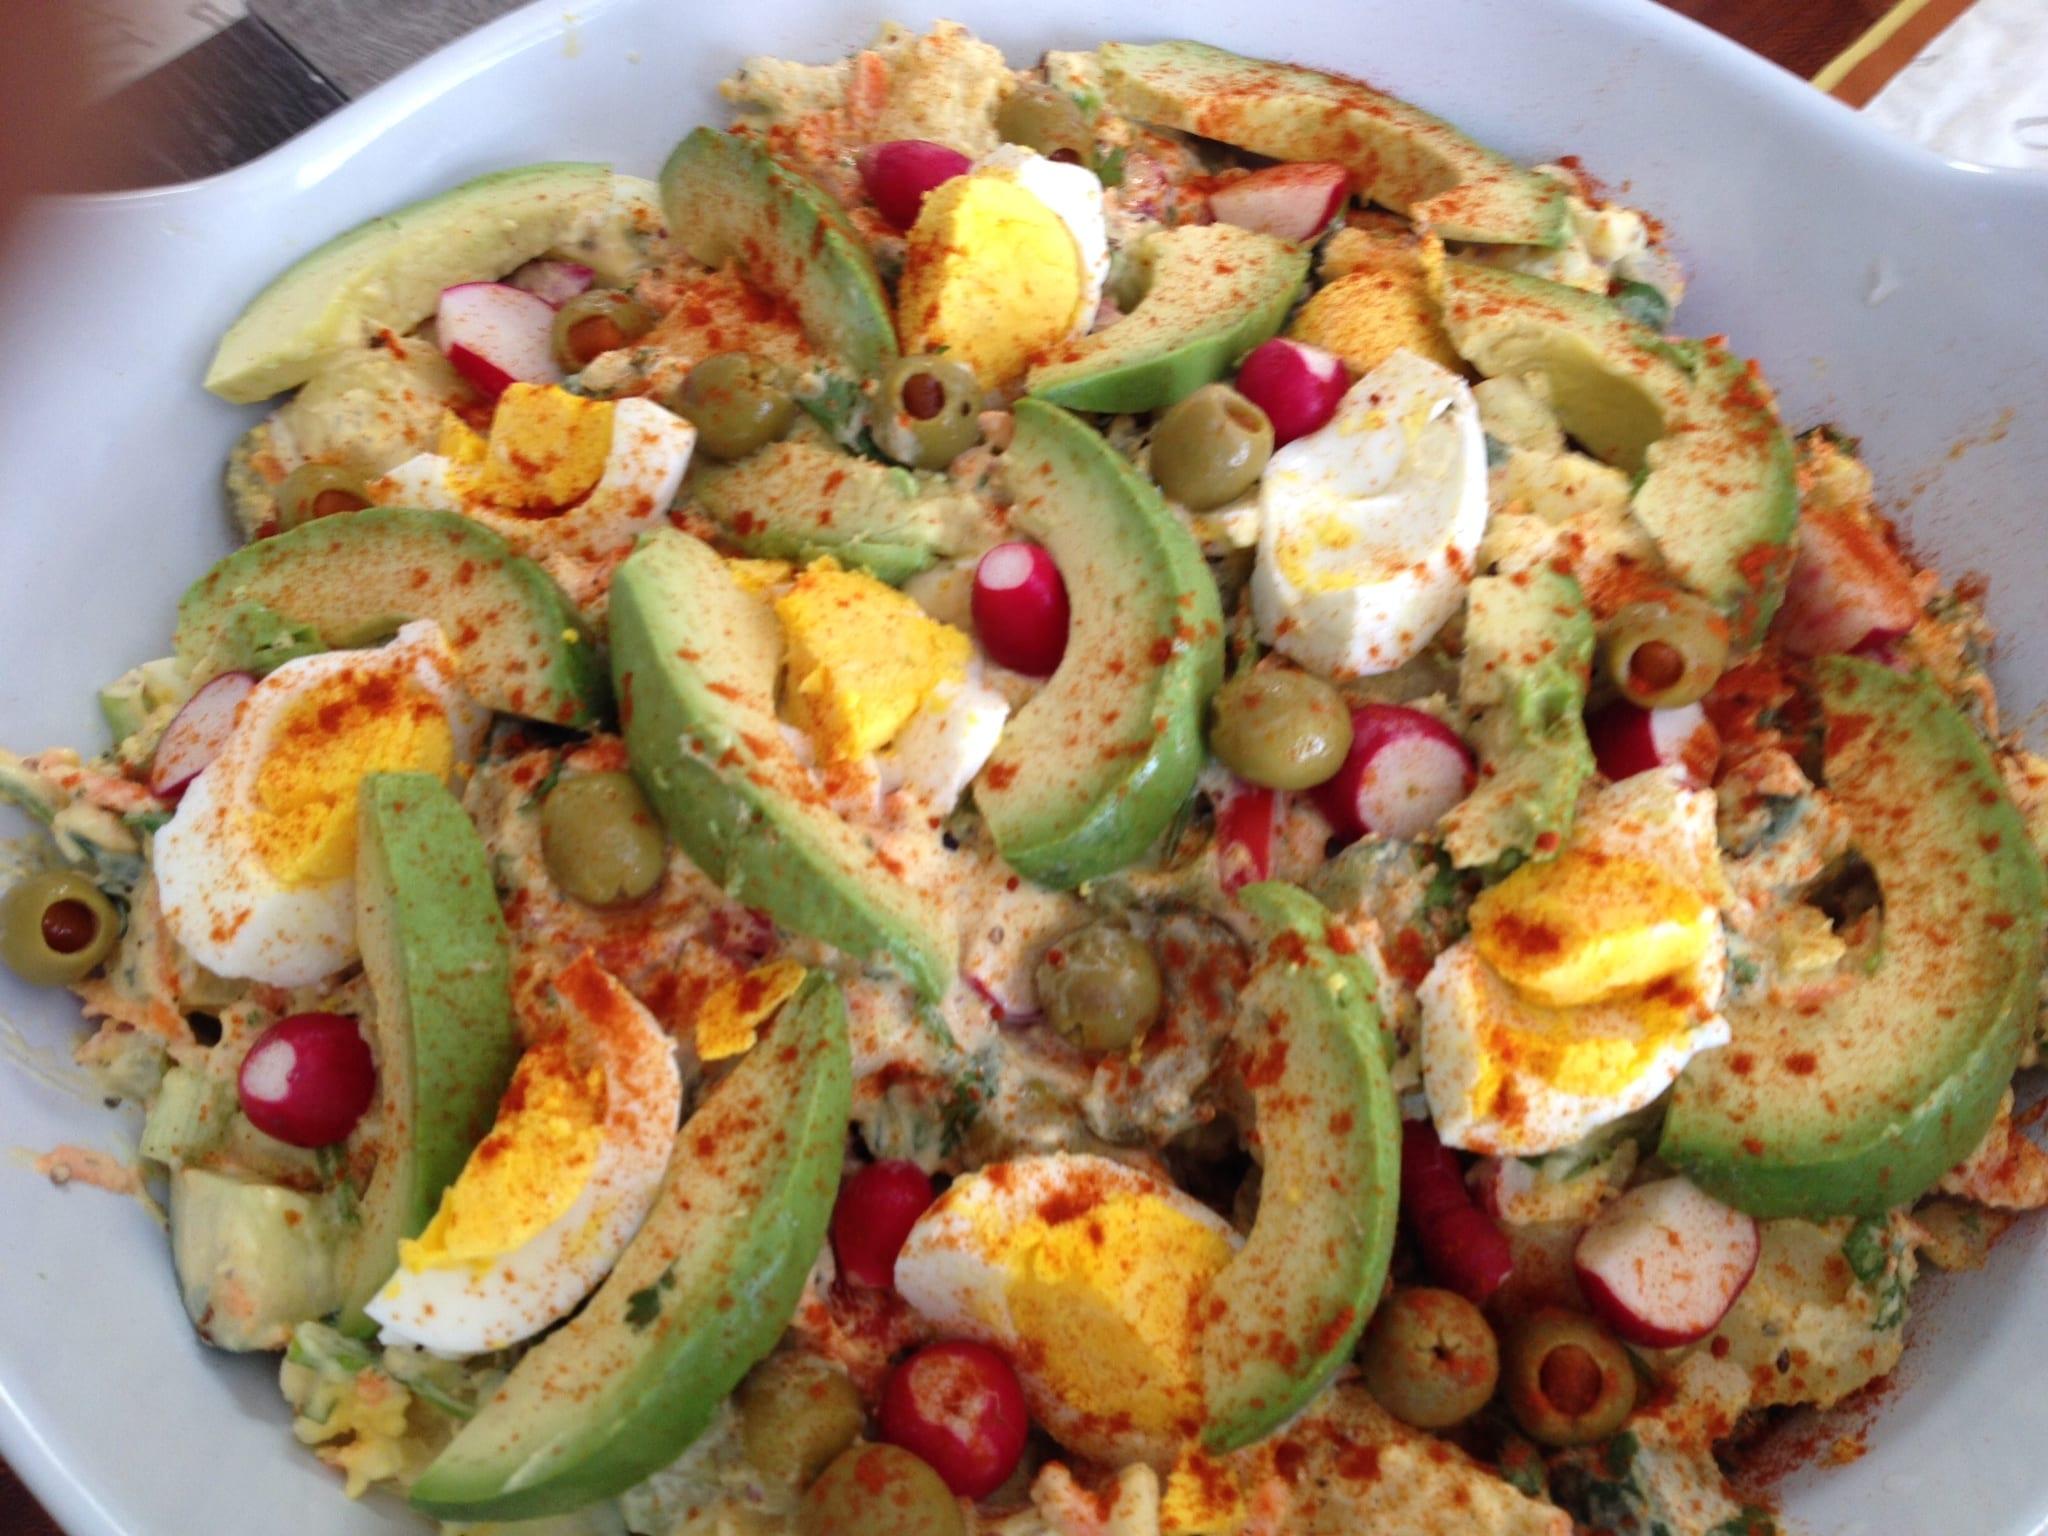 Summertime Golden Potato Salad